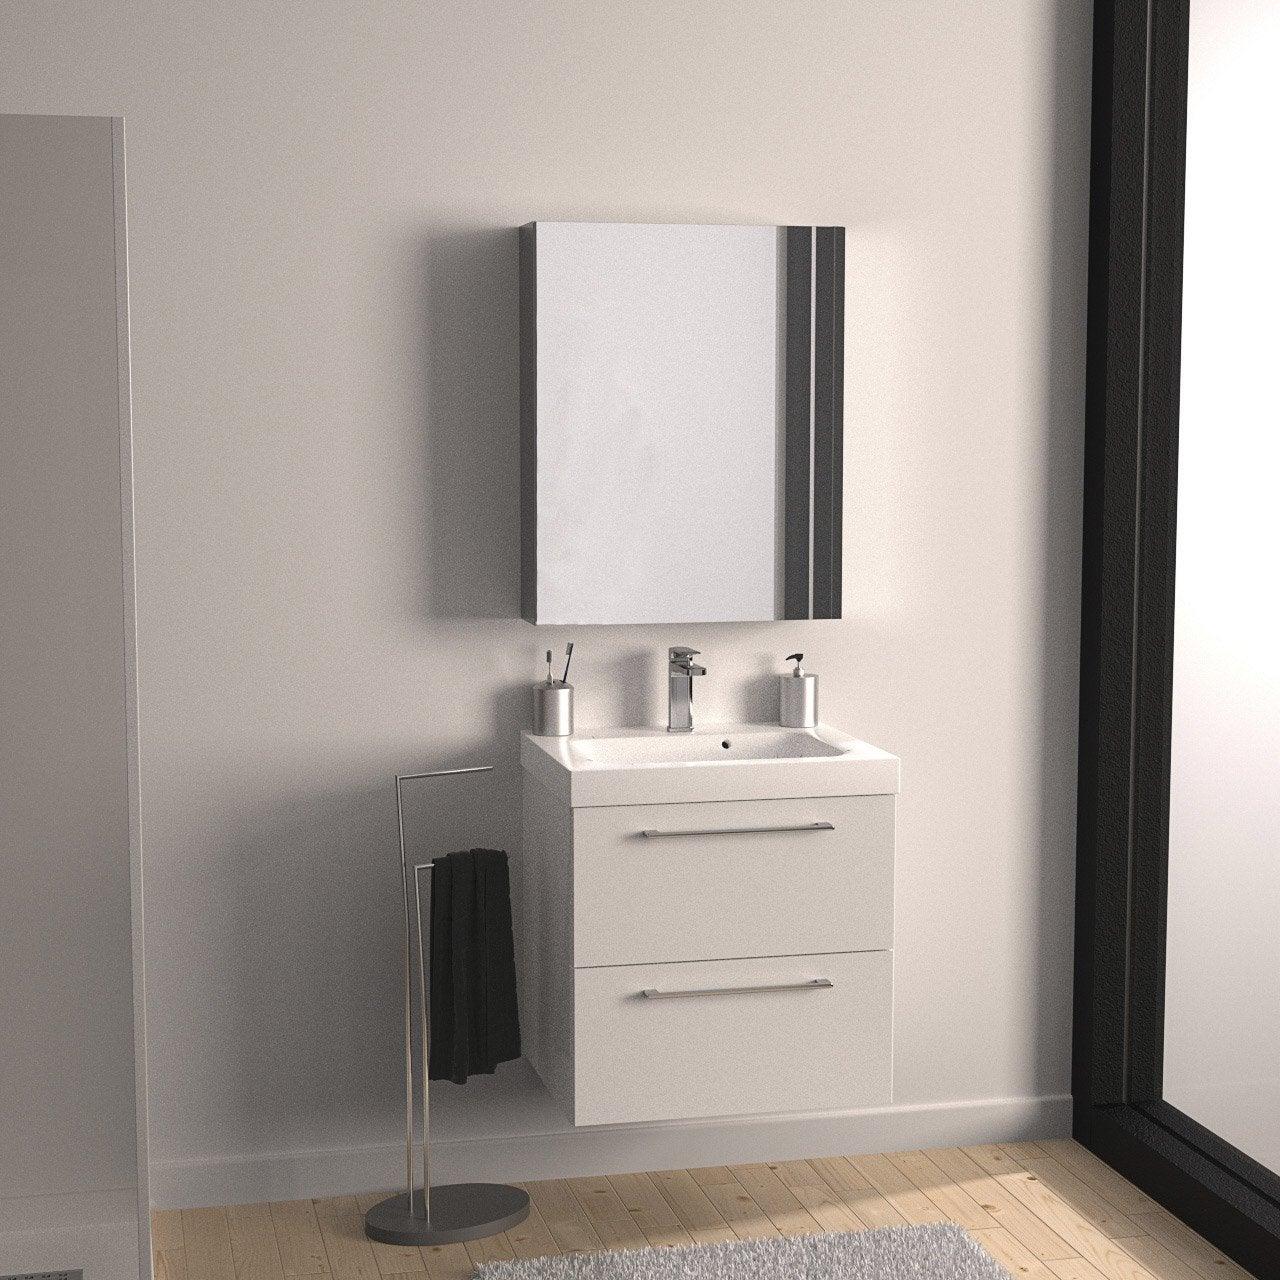 Meuble de salle de bains remix blanc blanc n 0 61x48 5 cm 2 tiroirs leroy - Meuble lavabo leroy merlin ...